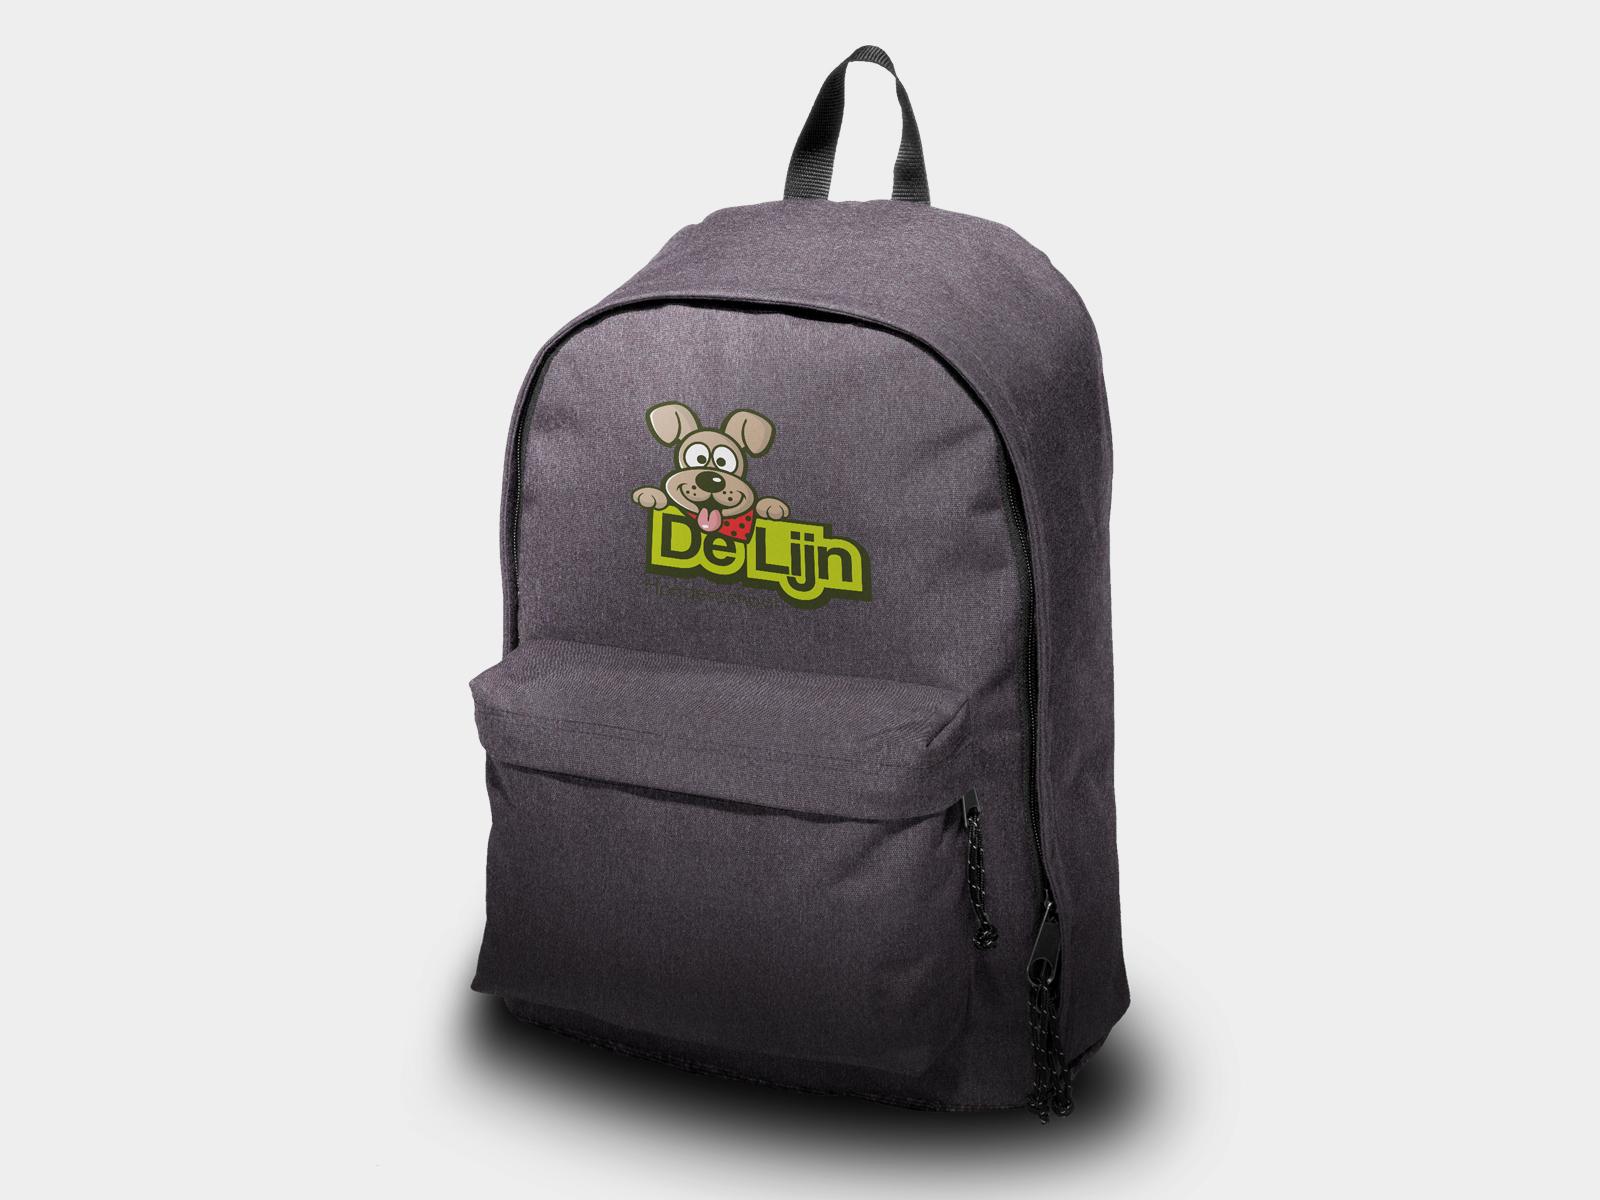 DeLijn Logo Design b